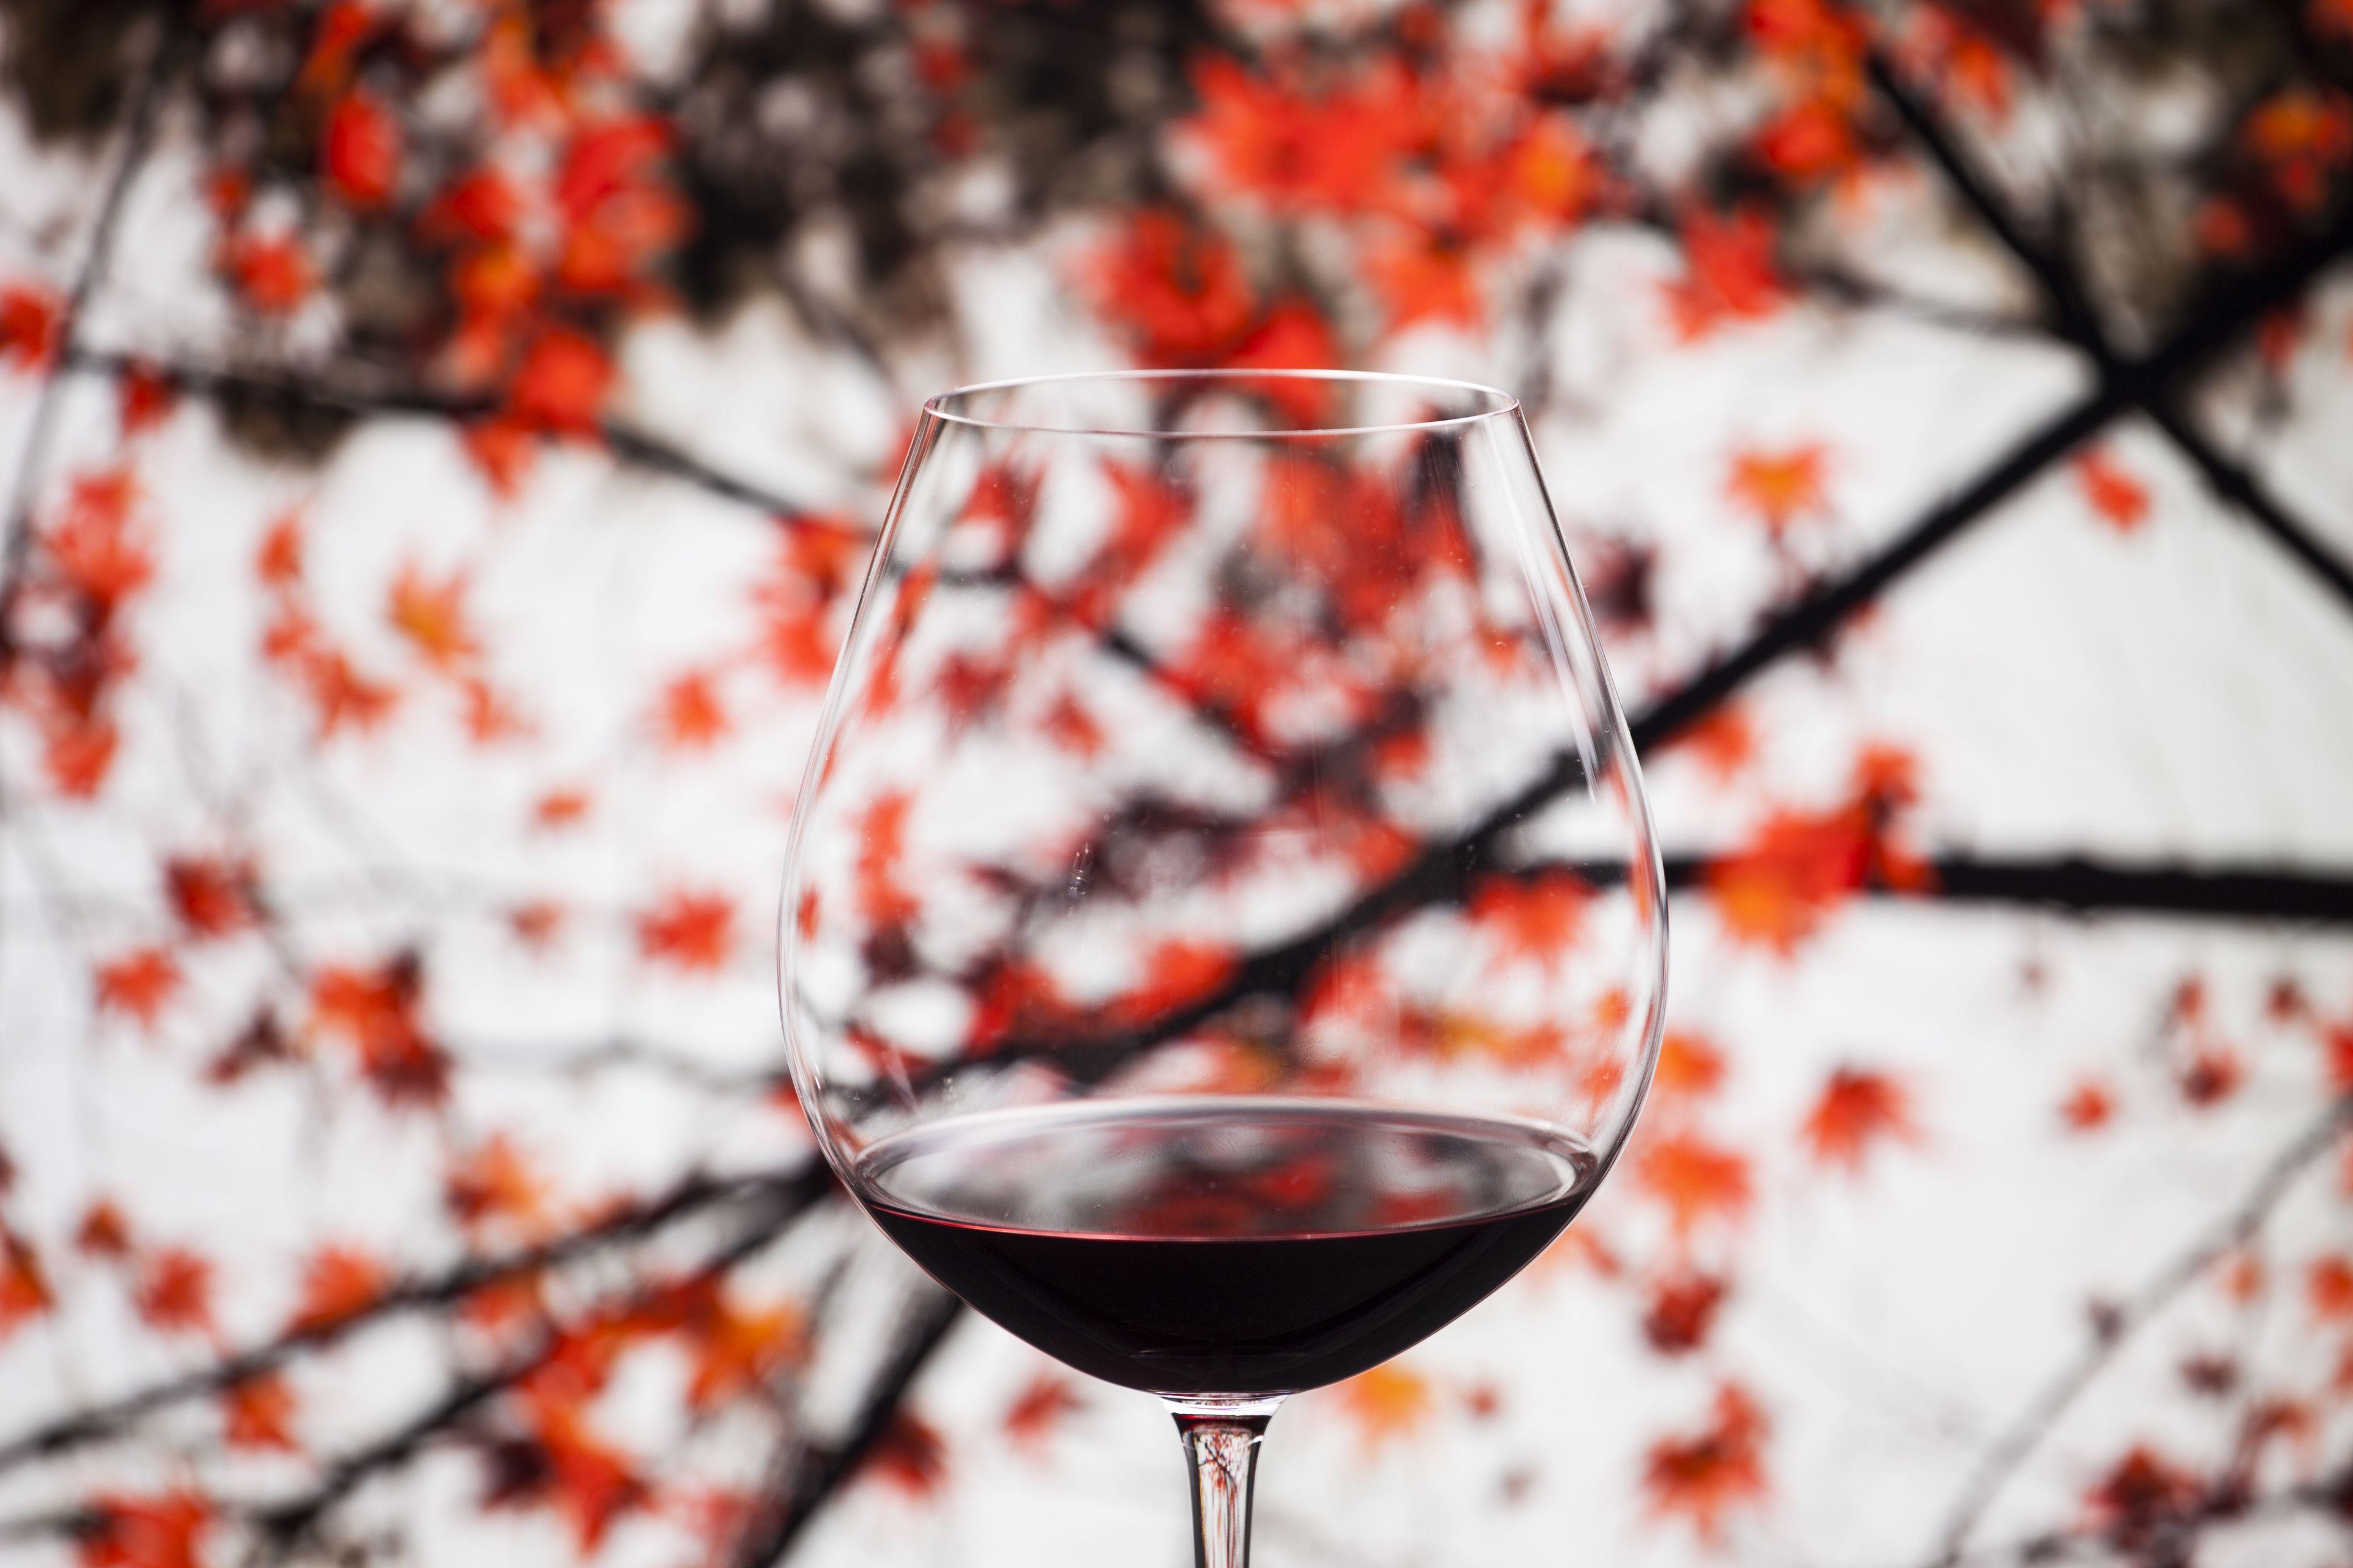 housebeautiful.com - Danielle Tullo - Fall Chore and Wine Pairings